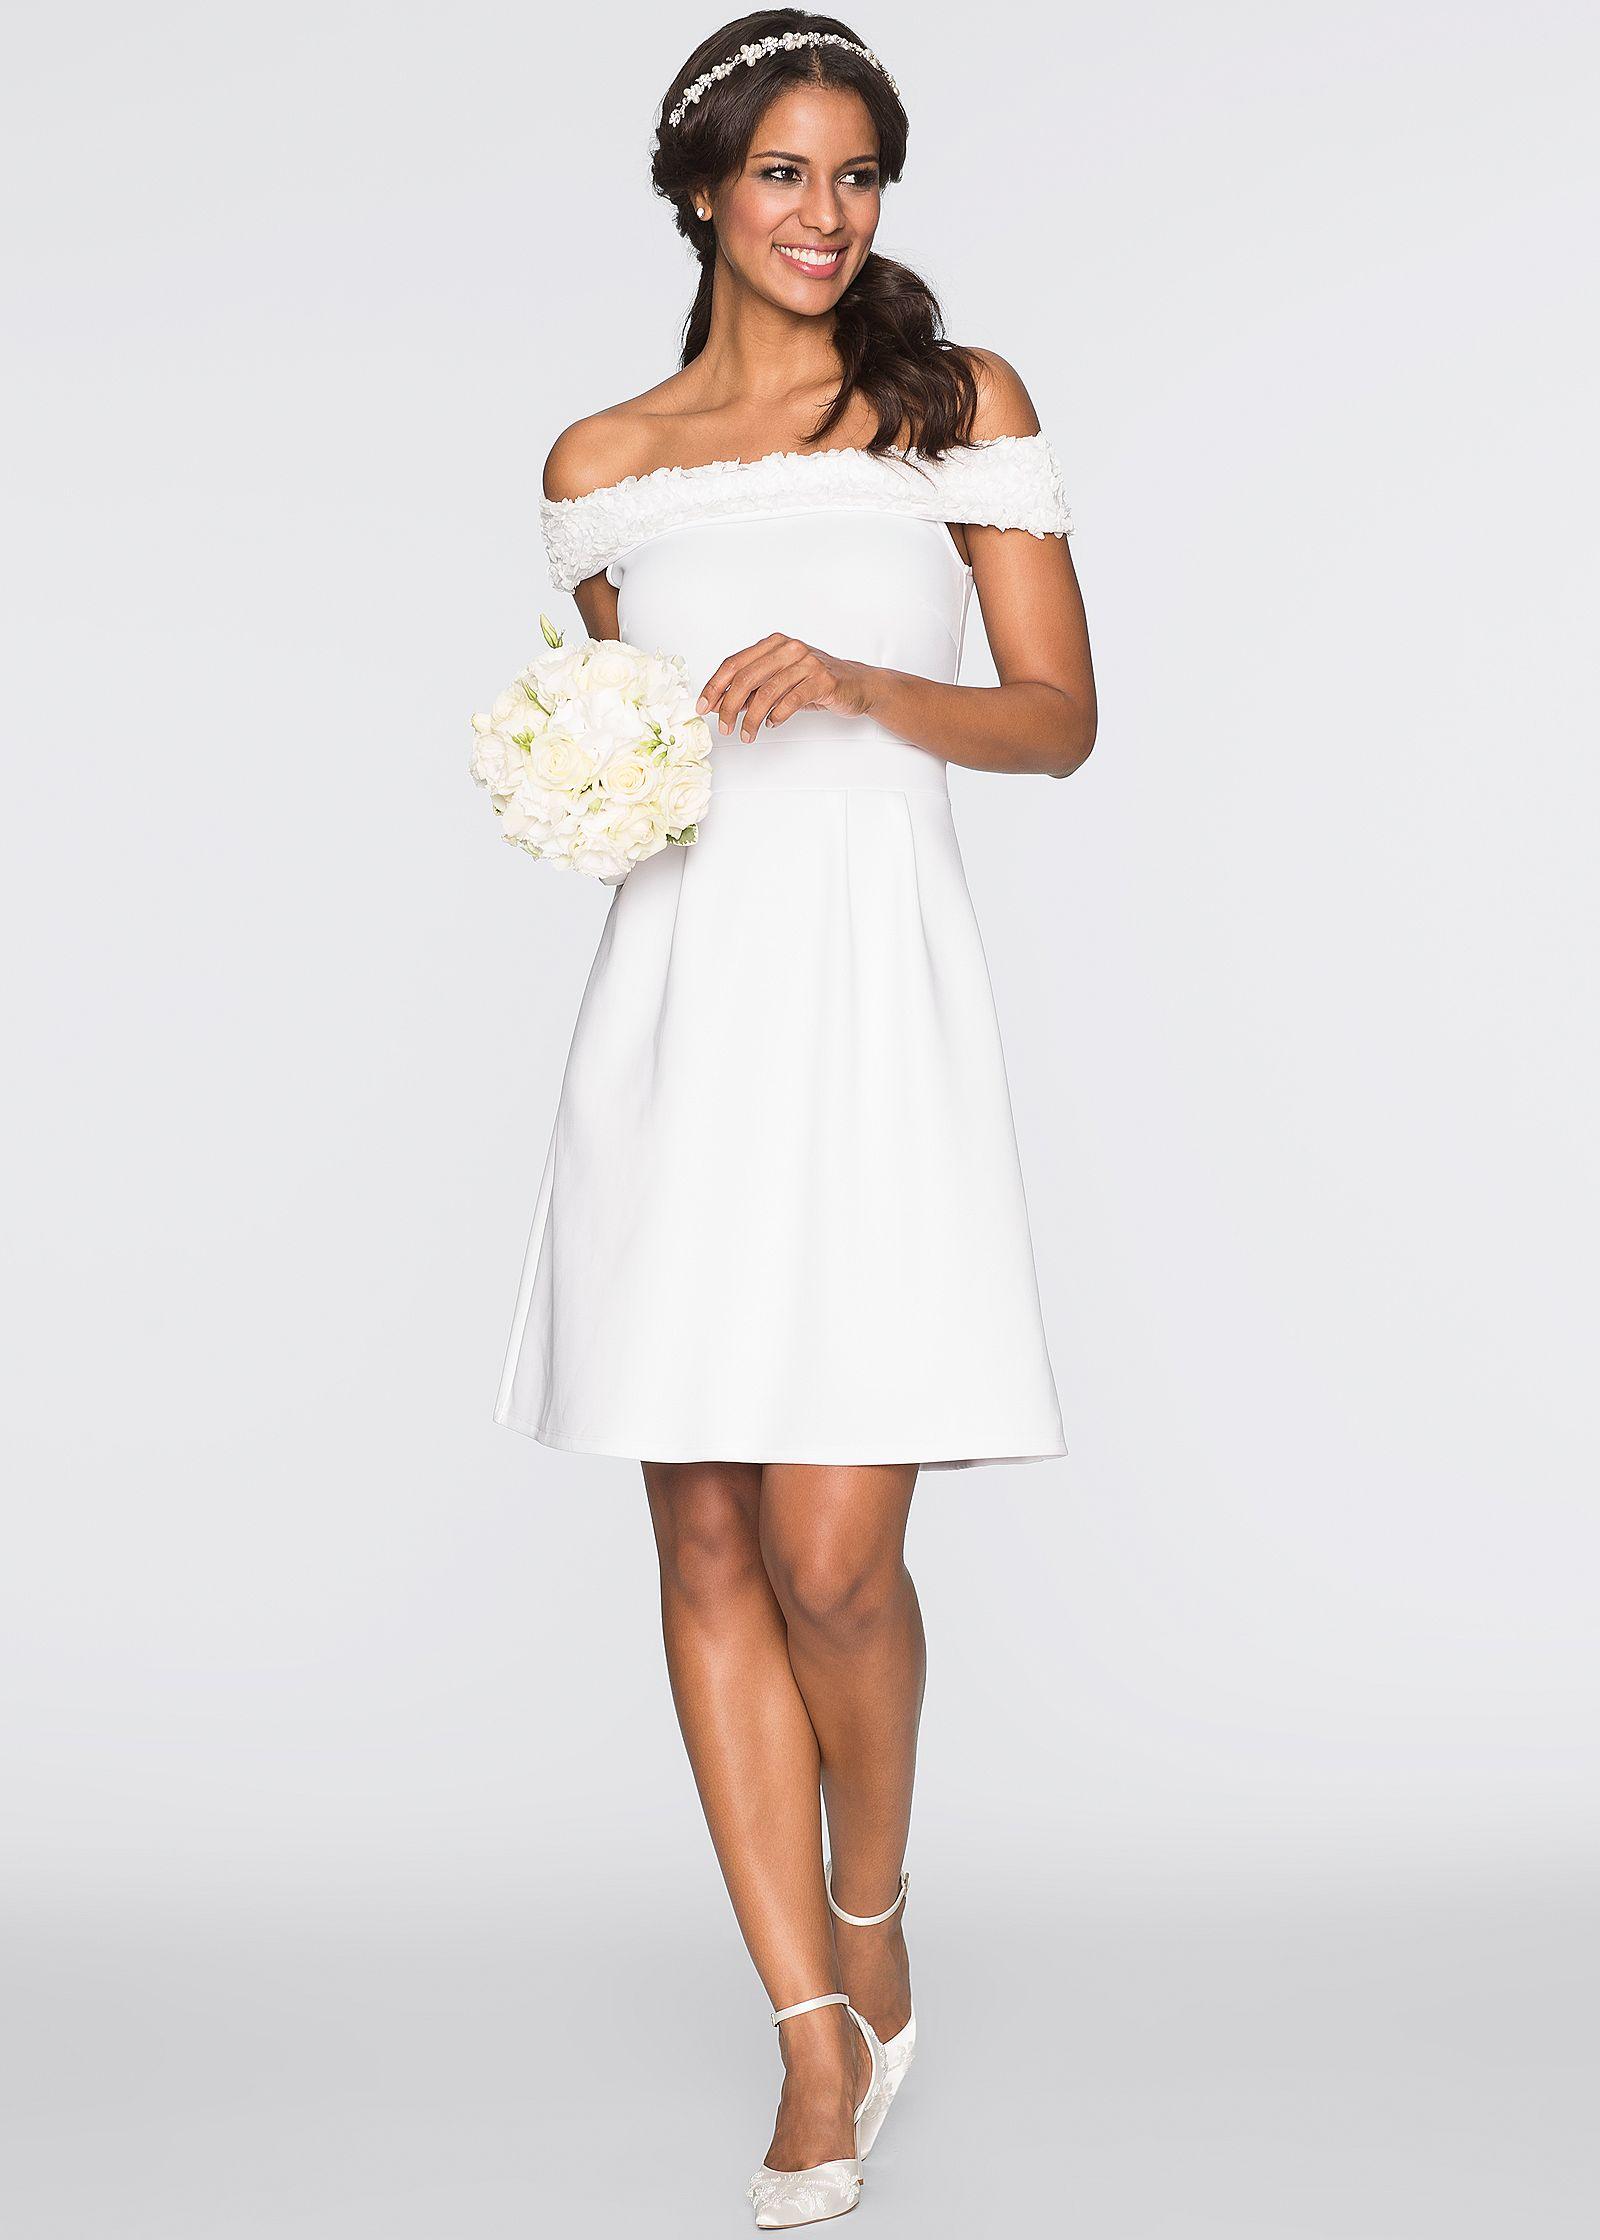 Backless Wedding Dress Bra 38 Good strapless wedding dress